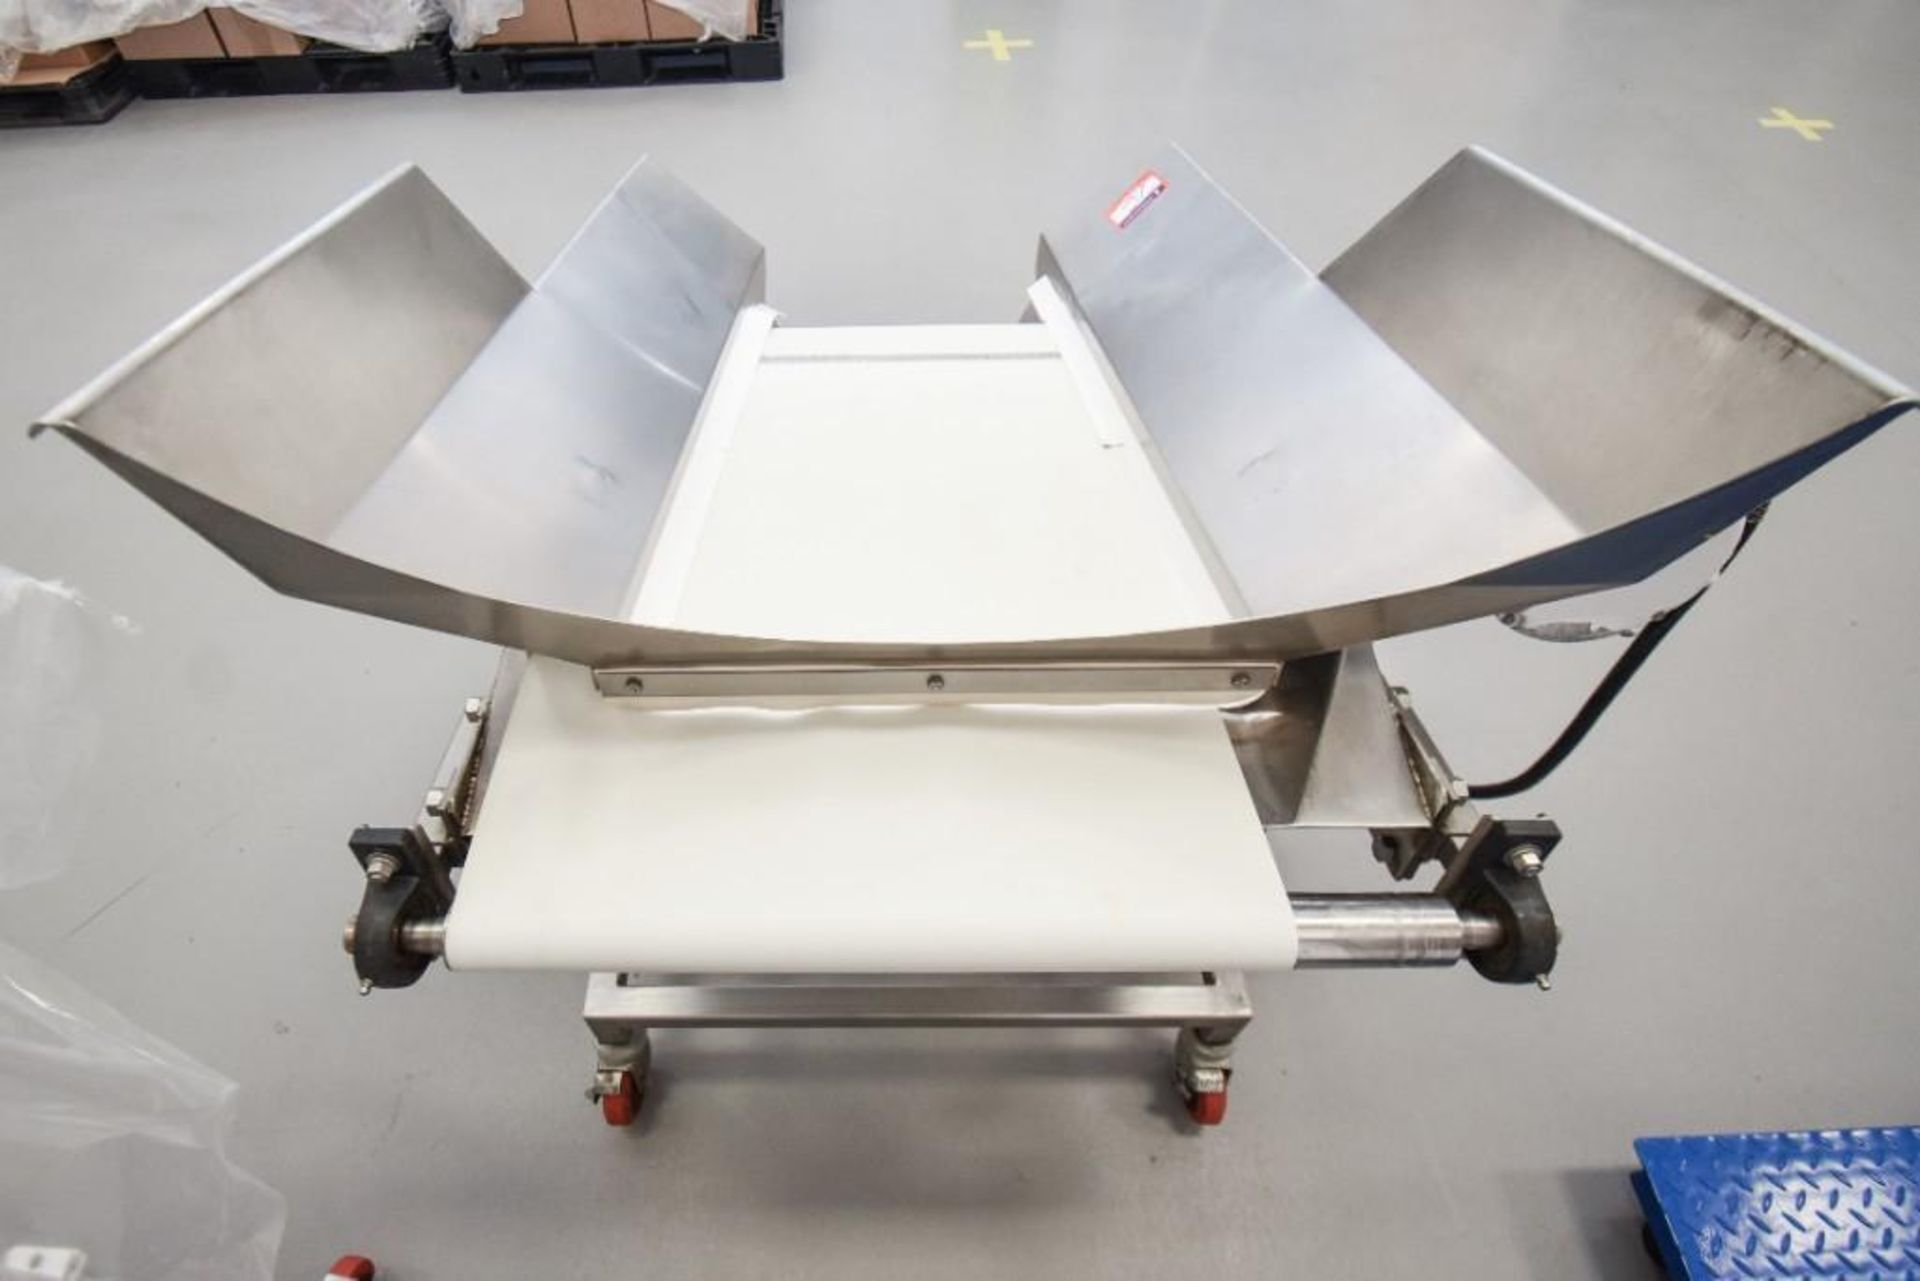 RBM Vibratory Deck With Food Grade Conveyor TS-B 24X3-0 - Image 5 of 7